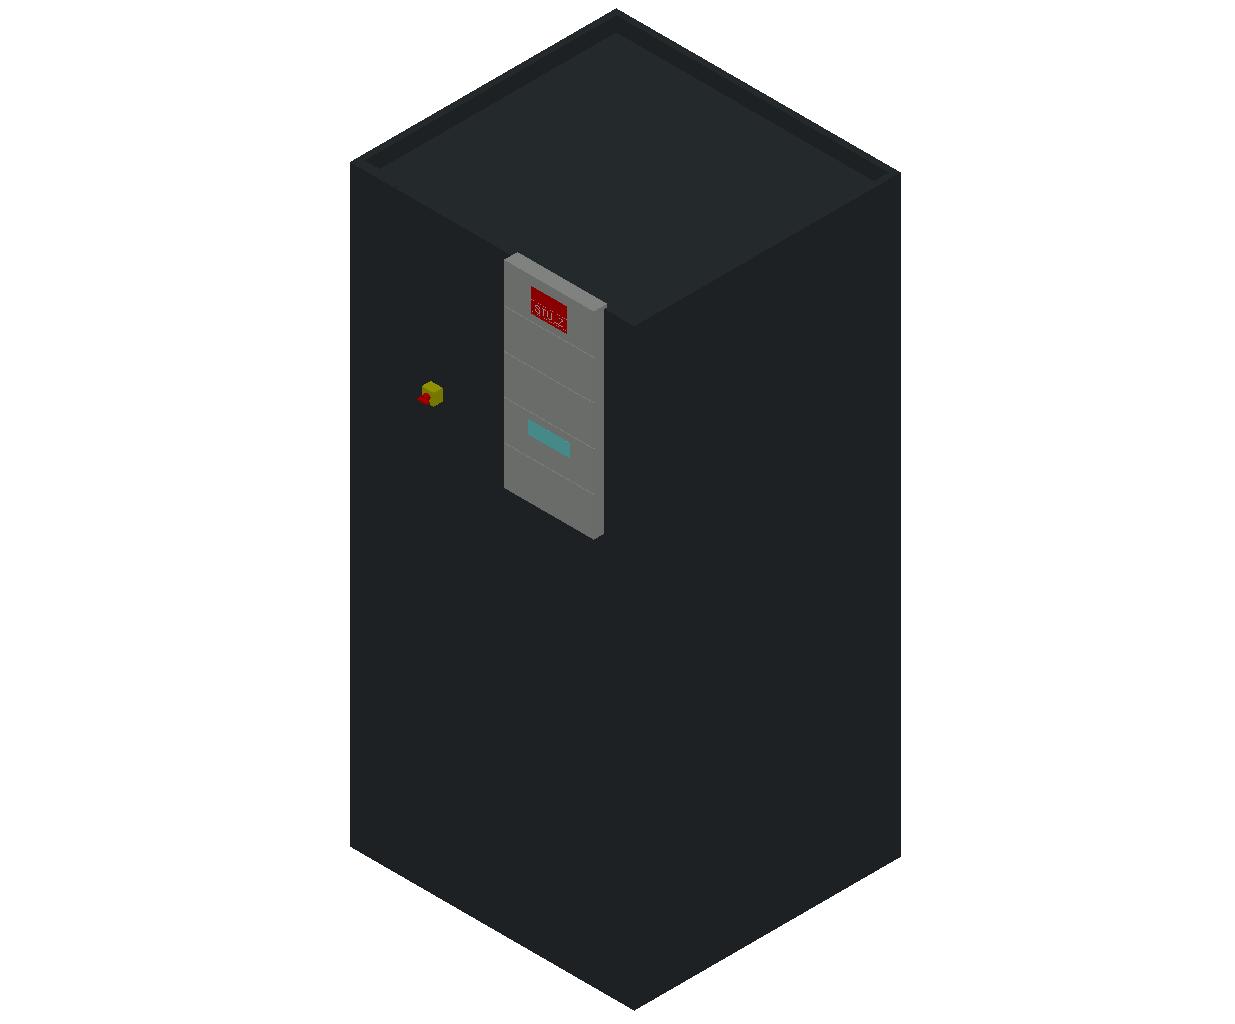 HC_Air Conditioner_Indoor Unit_MEPcontent_STULZ_CyberAir 3PRO_ASD-ALD_Single Circuit GE_ALD_471_GE_INT-EN.dwg